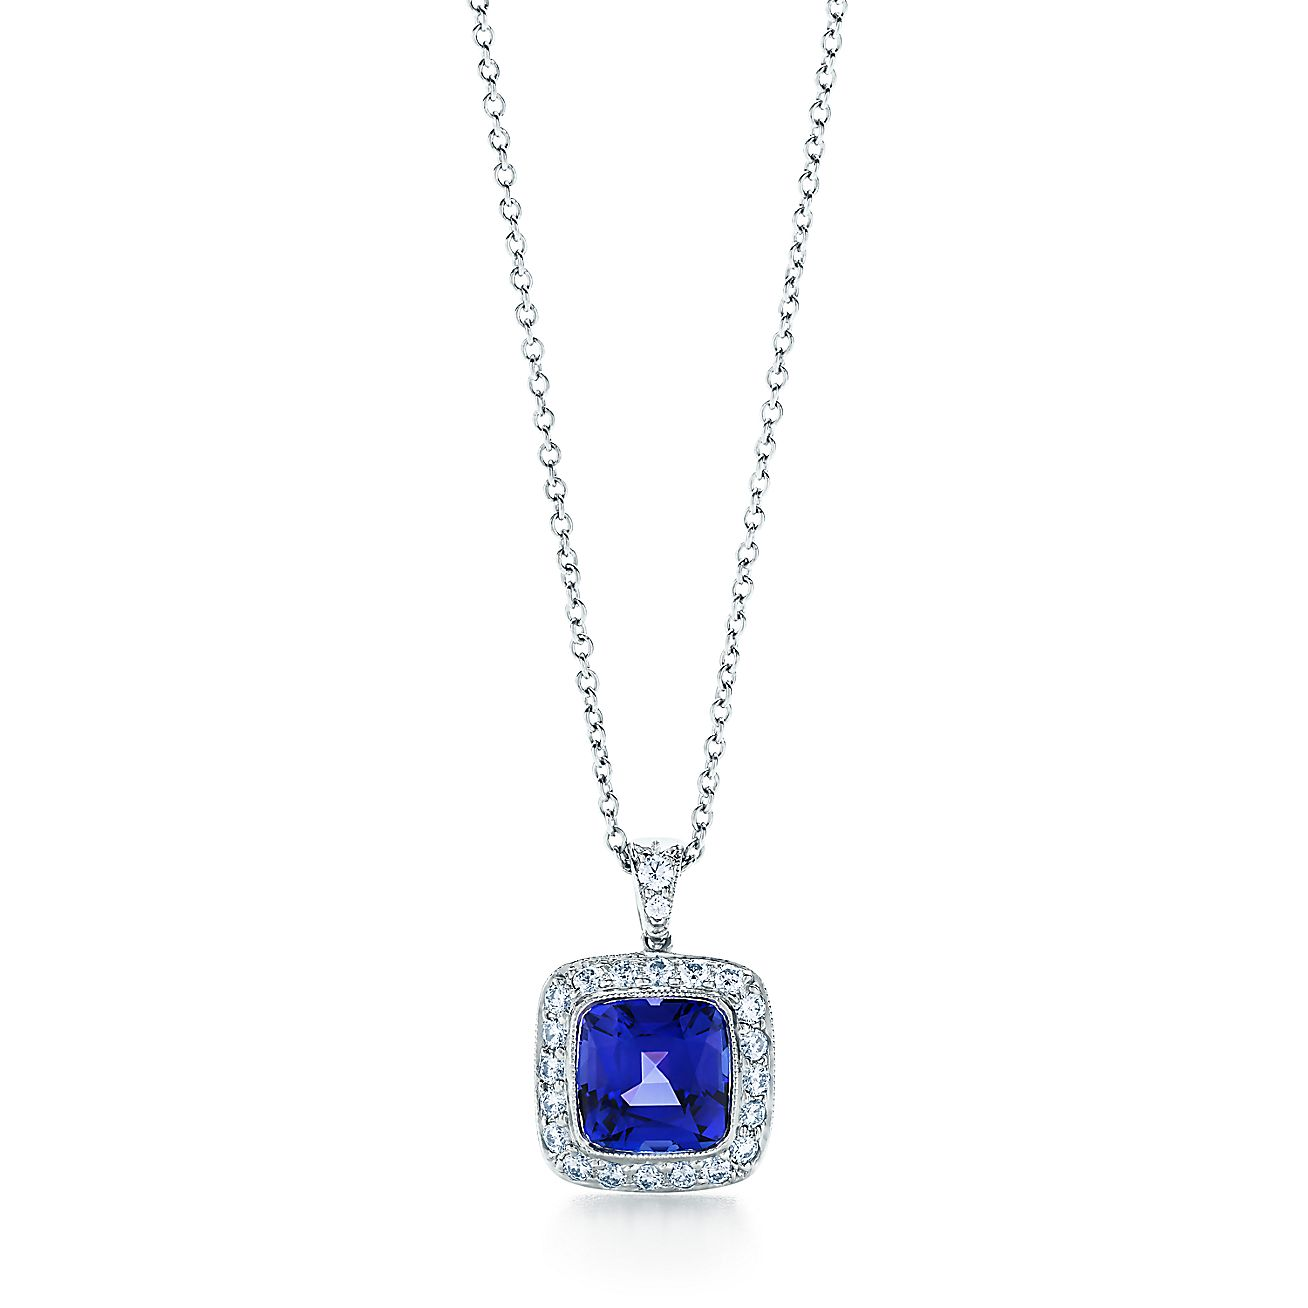 Tiffany Legacy® tanzanite pendant in platinum with